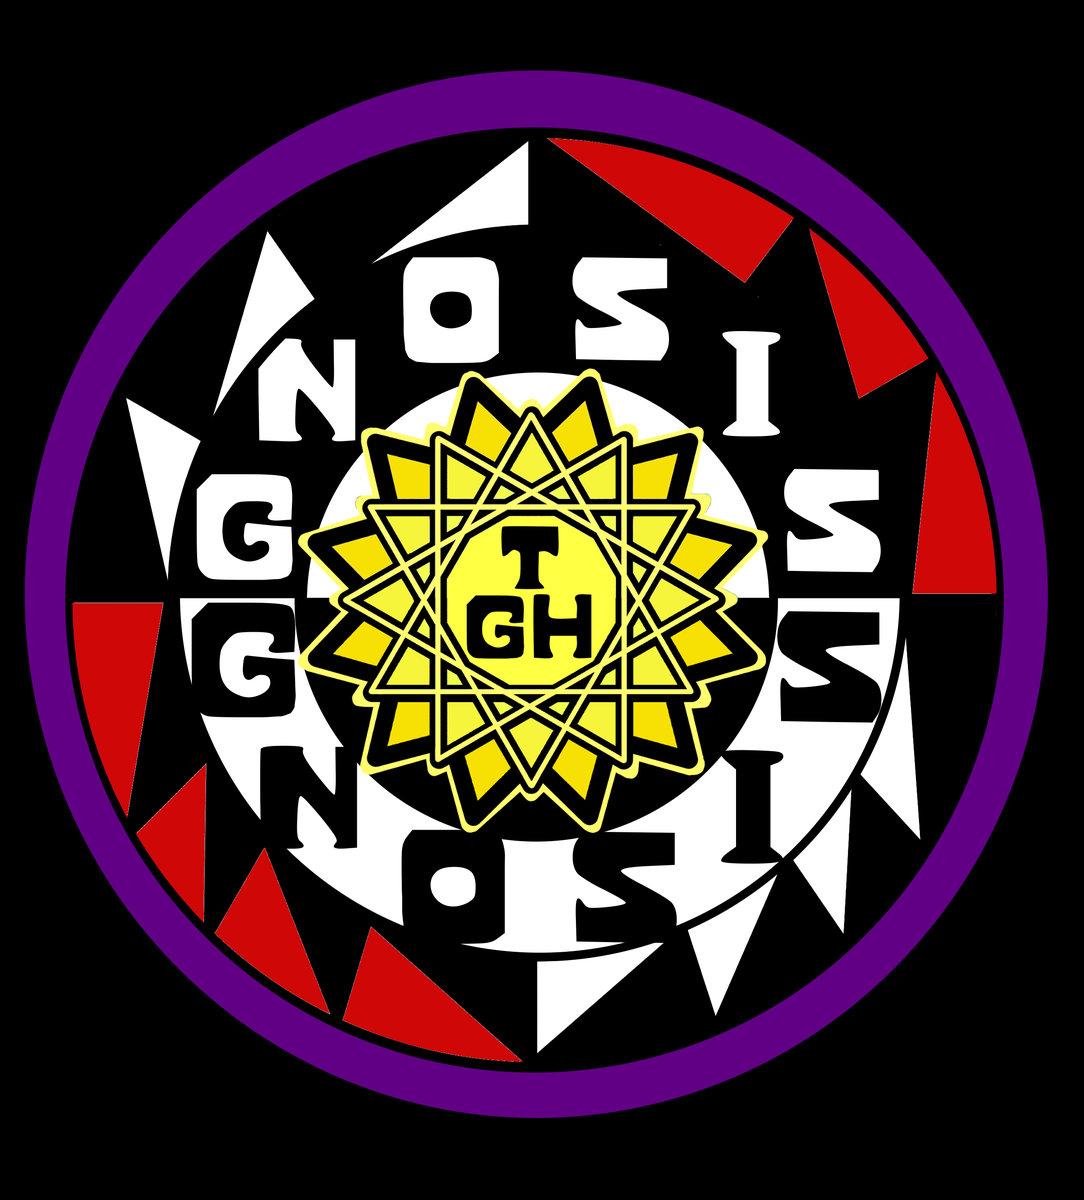 The Golden Hexegrams Gnosis (Oakland 2018)